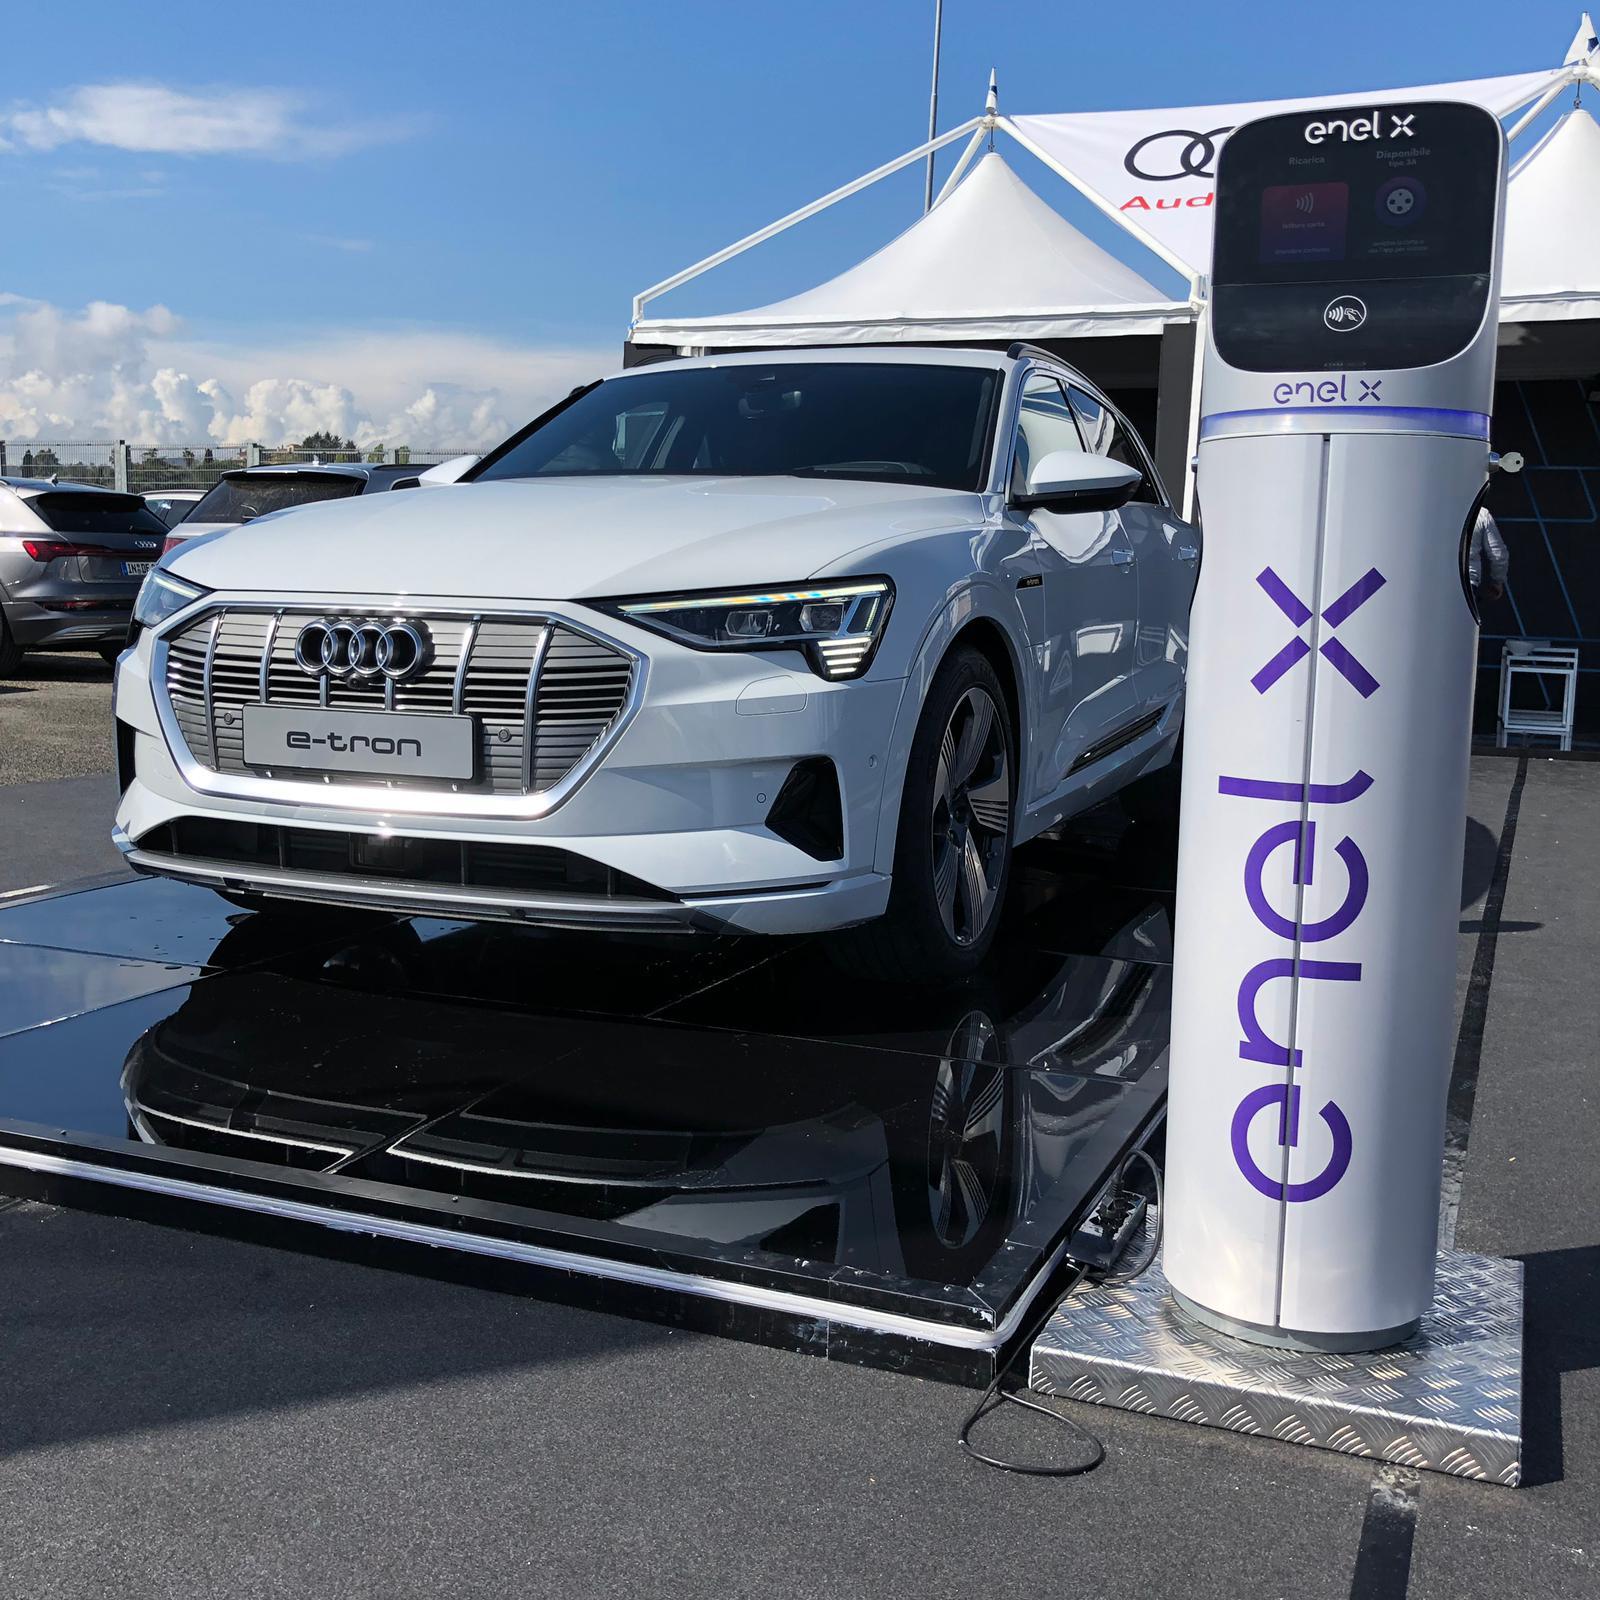 nuova-audi-e-tron-anteprima-fleet-motor-day-2019